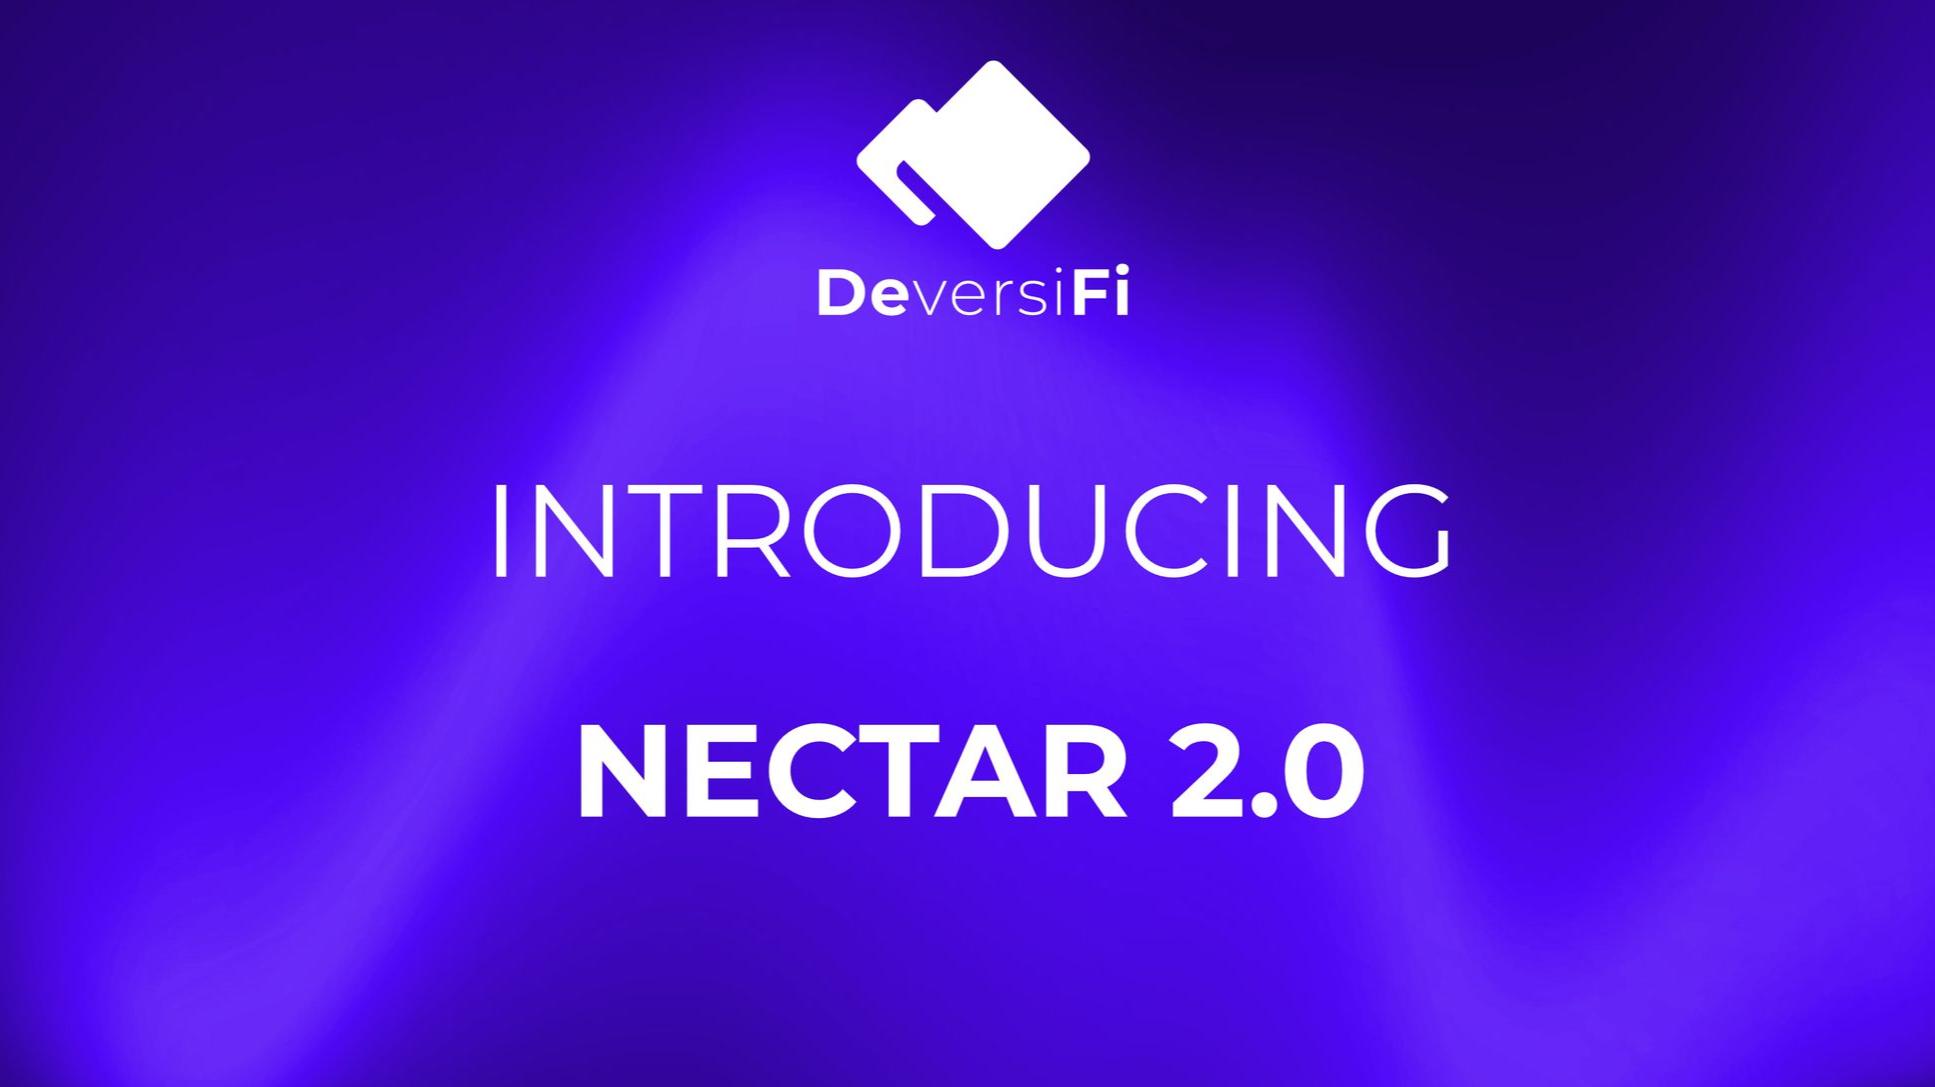 Introducing Nectar 2.0